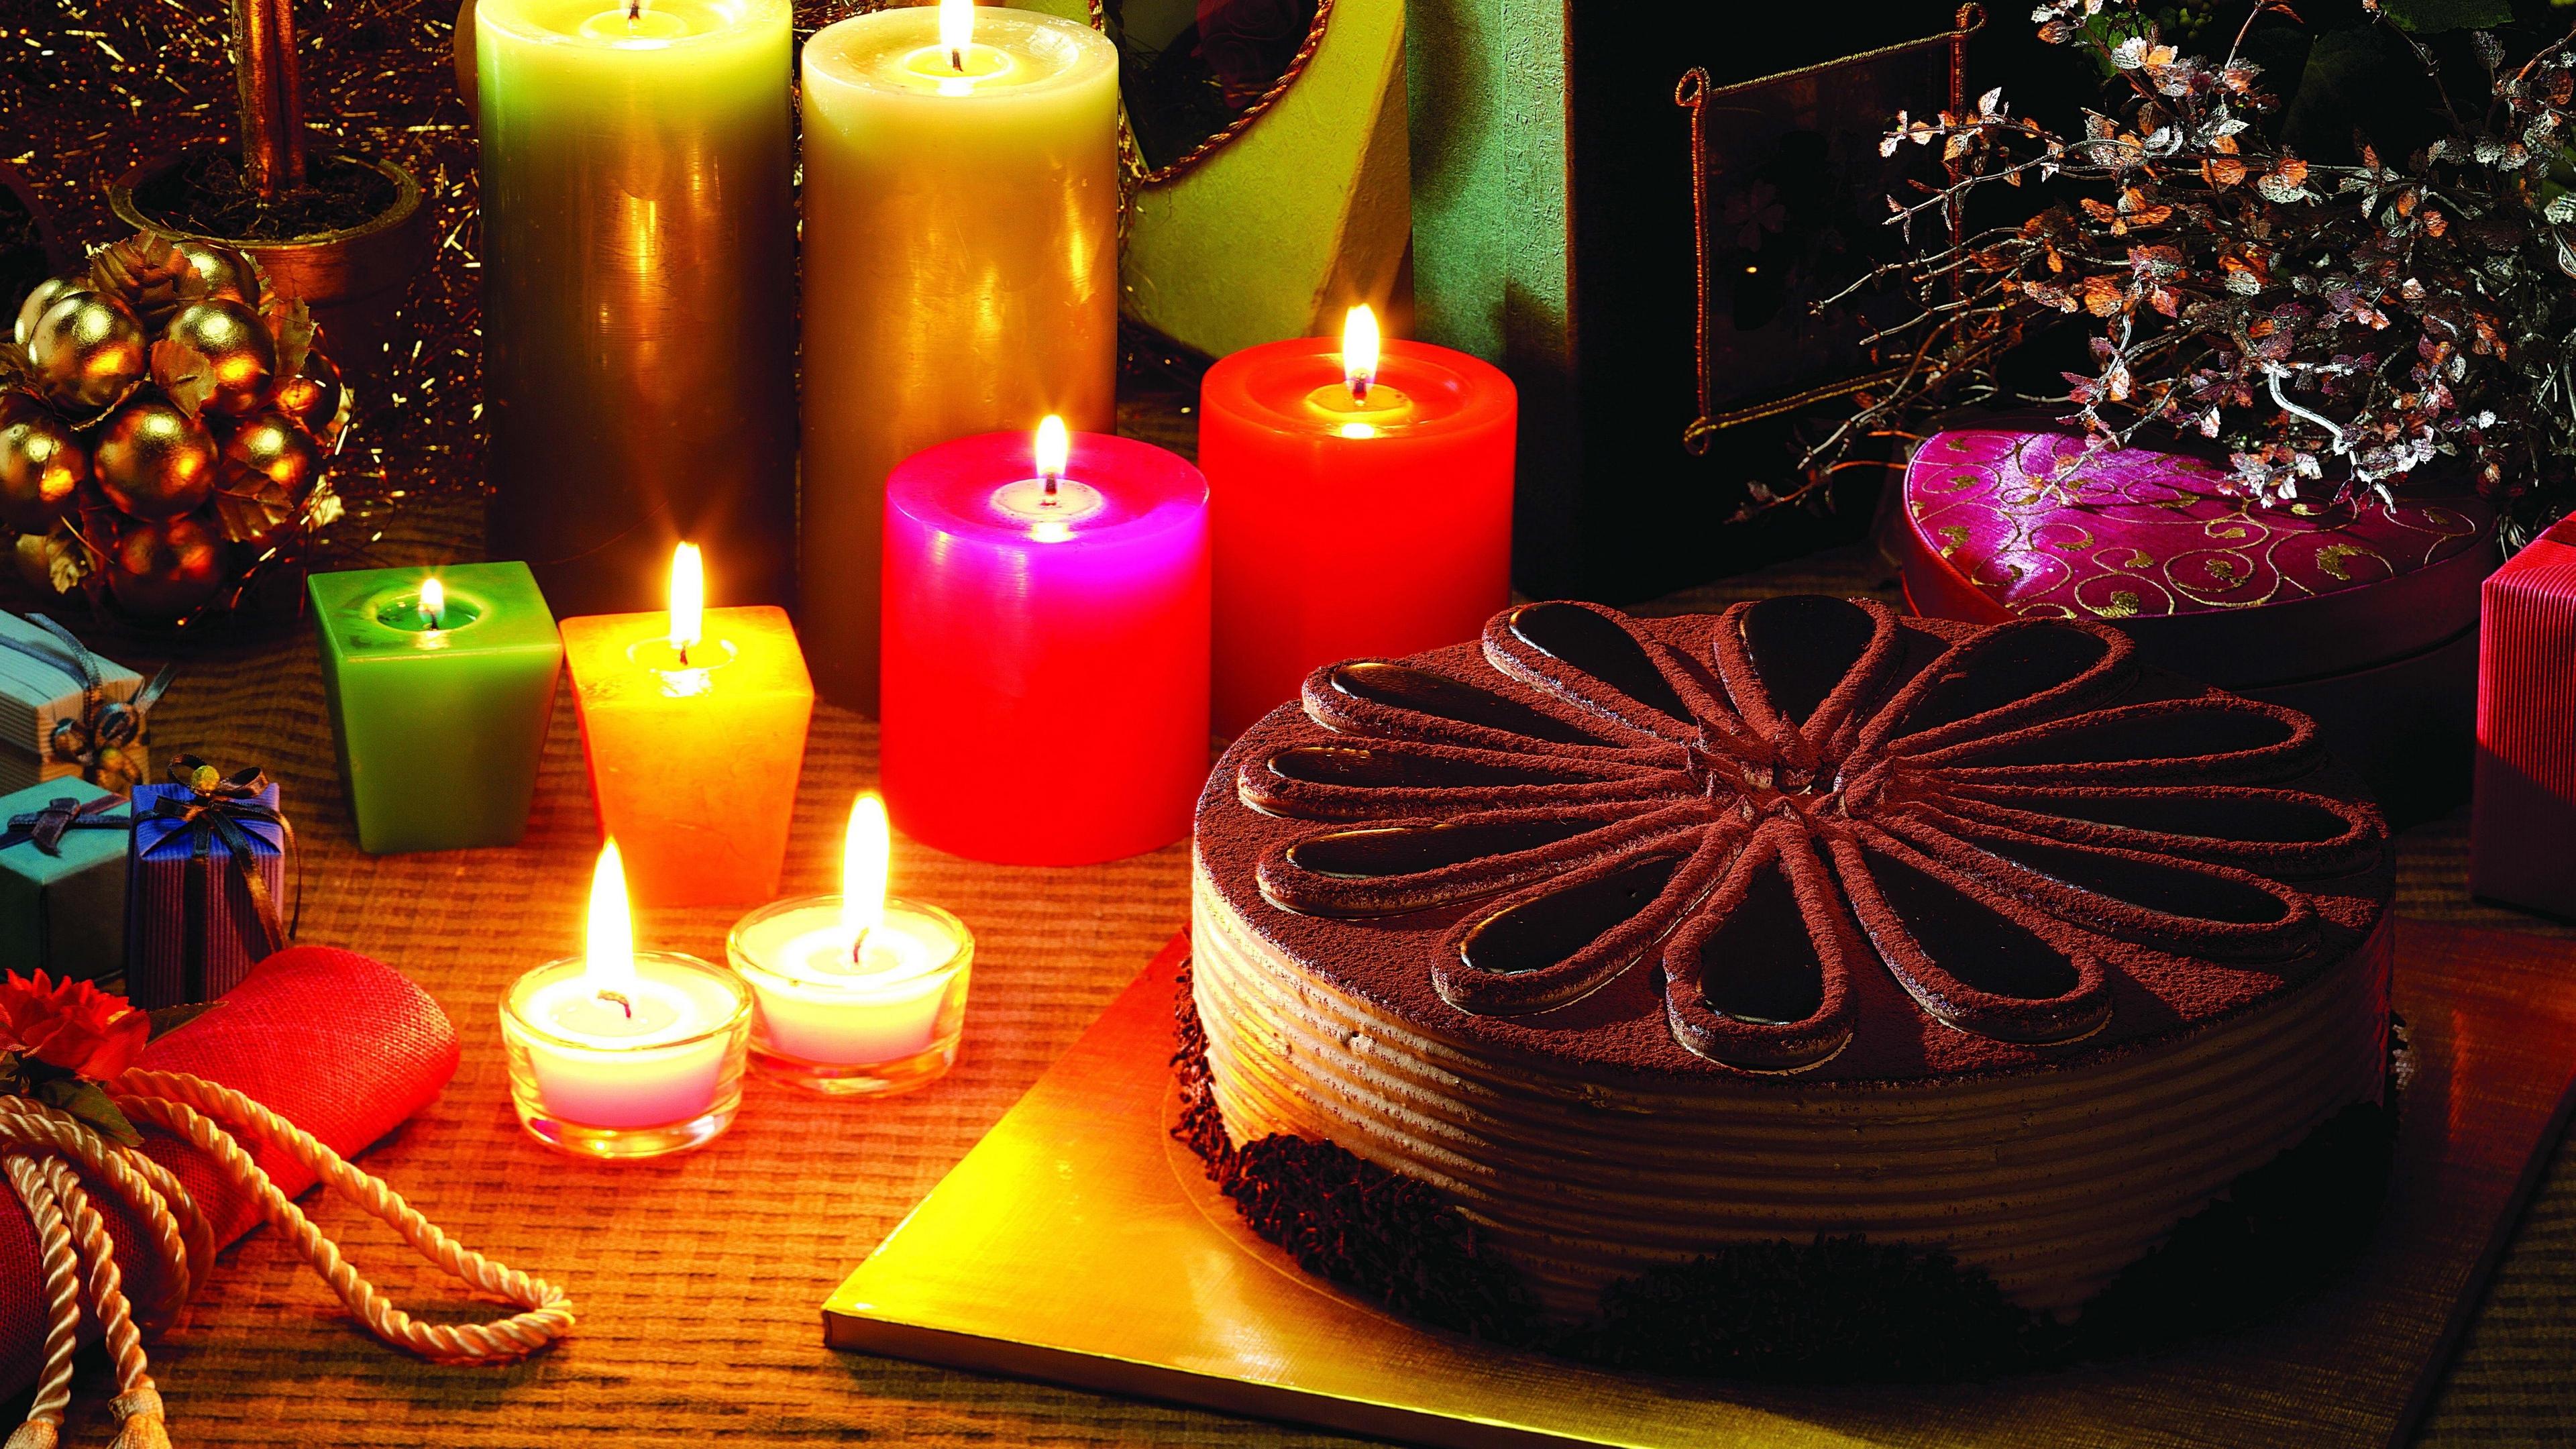 christmas candles cake presents reindeer holiday 4k 1538345080 - christmas candles, cake, presents, reindeer, holiday 4k - presents, christmas candles, cake